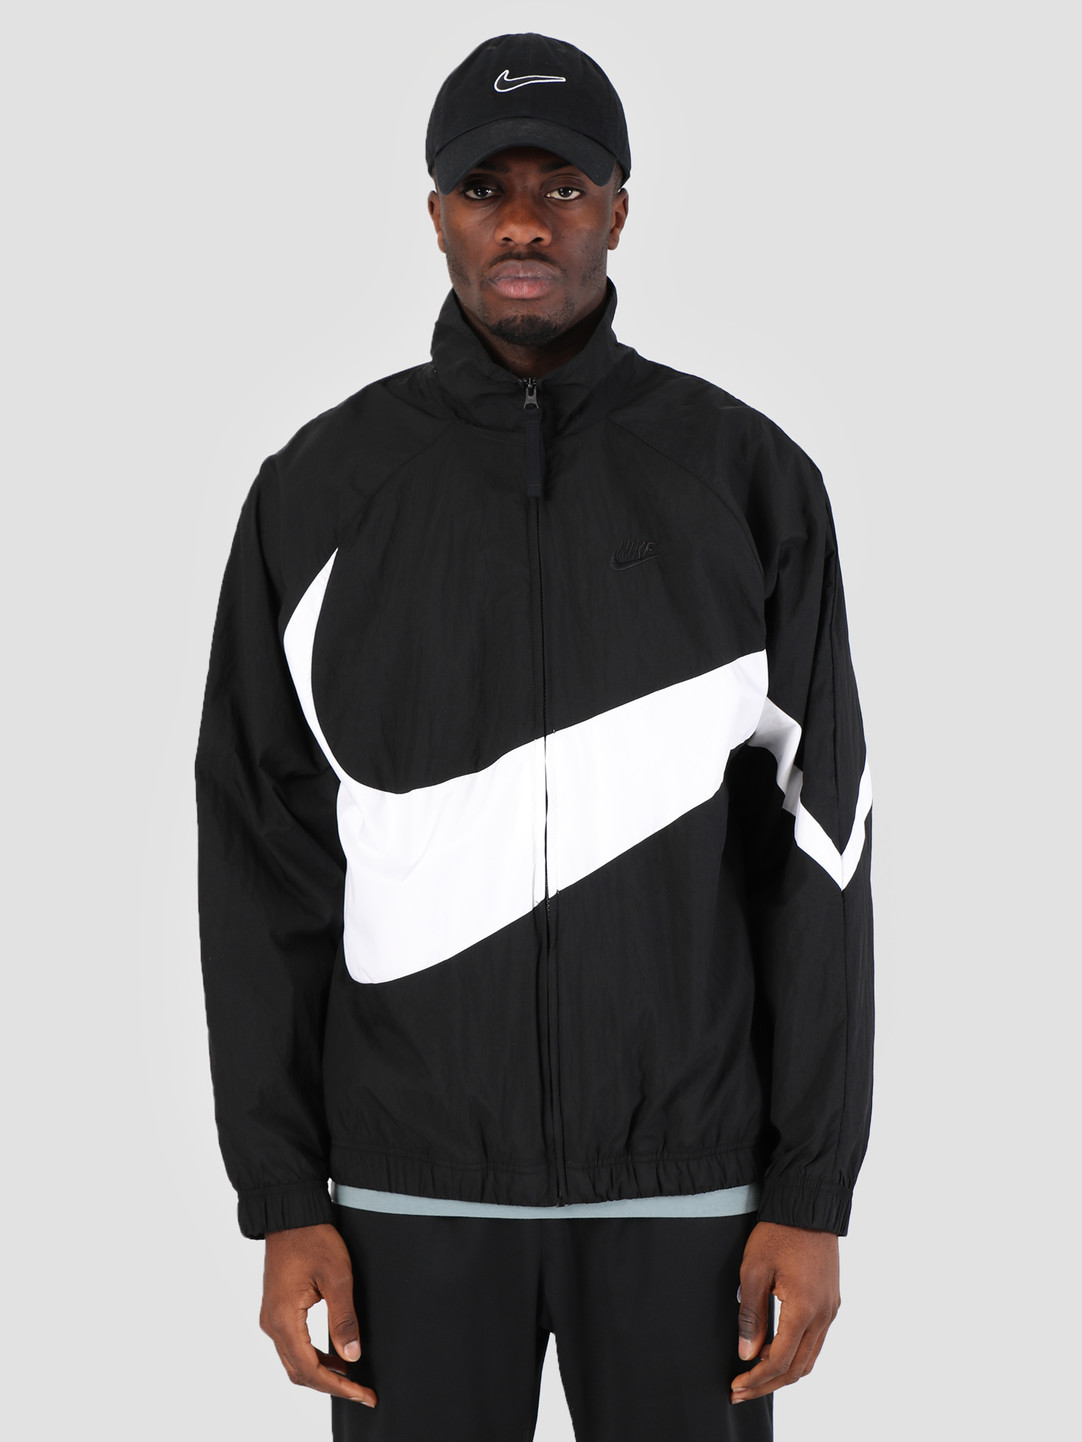 the best attitude 65581 70a9f Nike Nike Sportswear Jacket Black White Black Black Ar3132-010